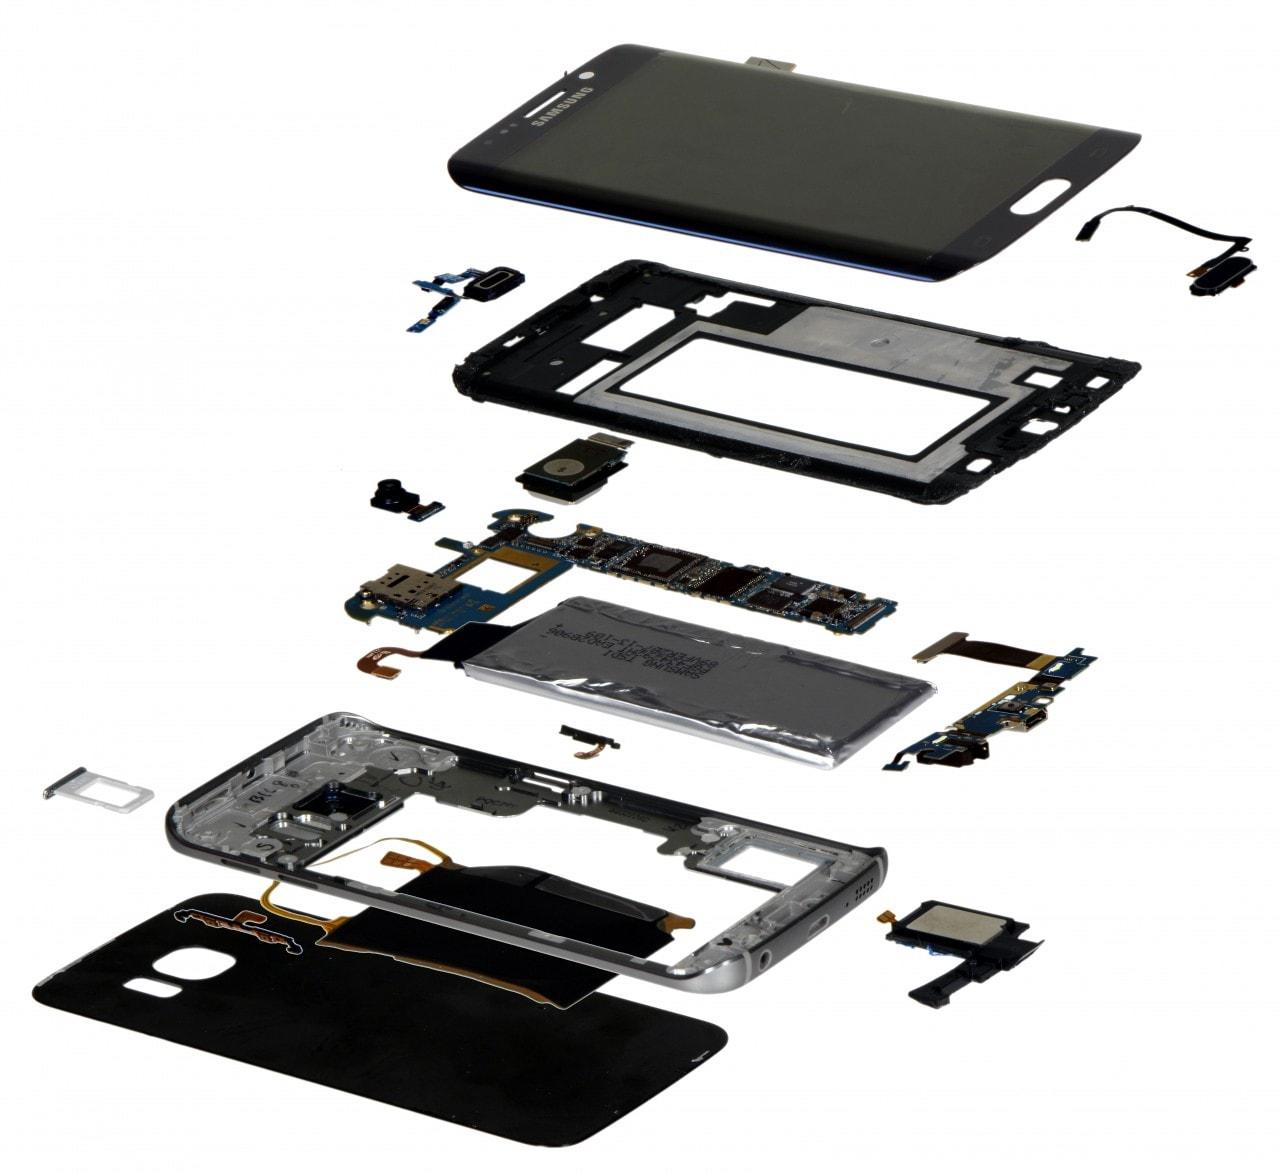 Samsung galaxy s6 edge exploded